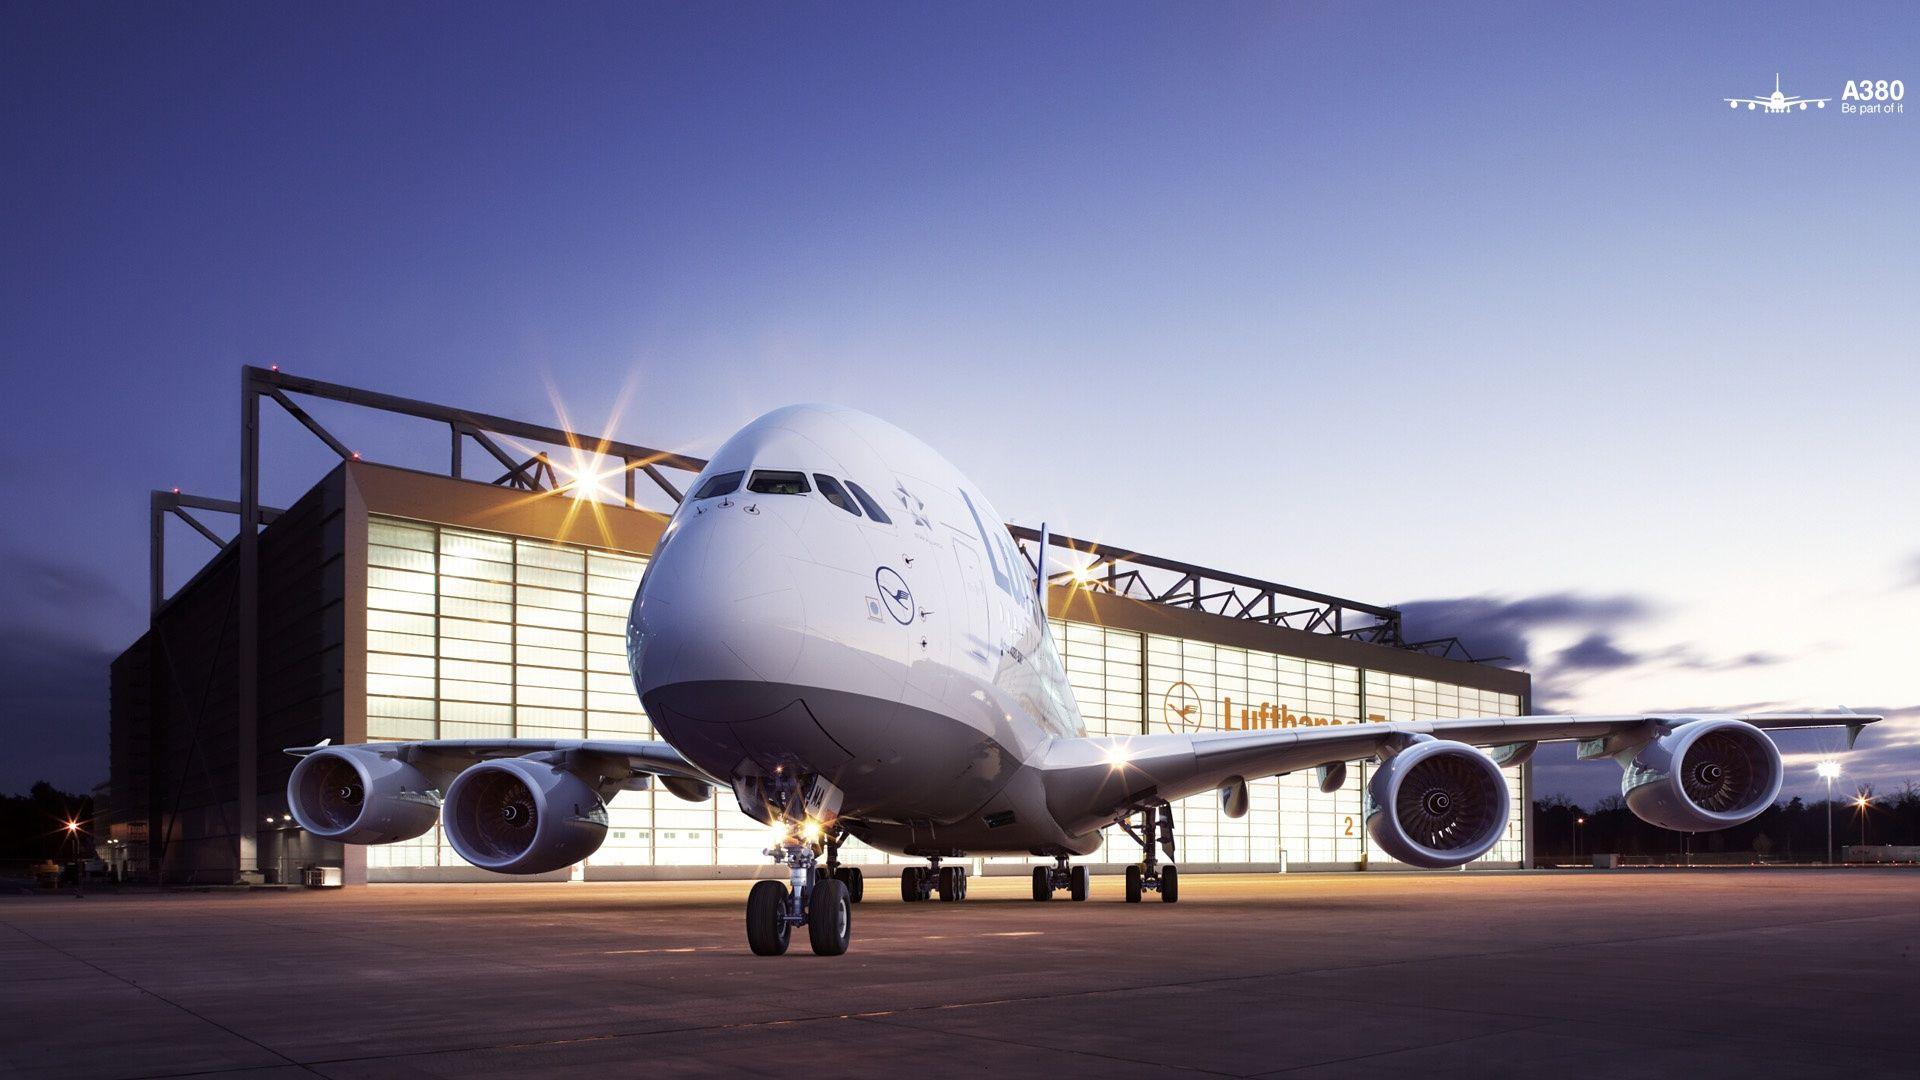 lufthansa at frankfurt A380